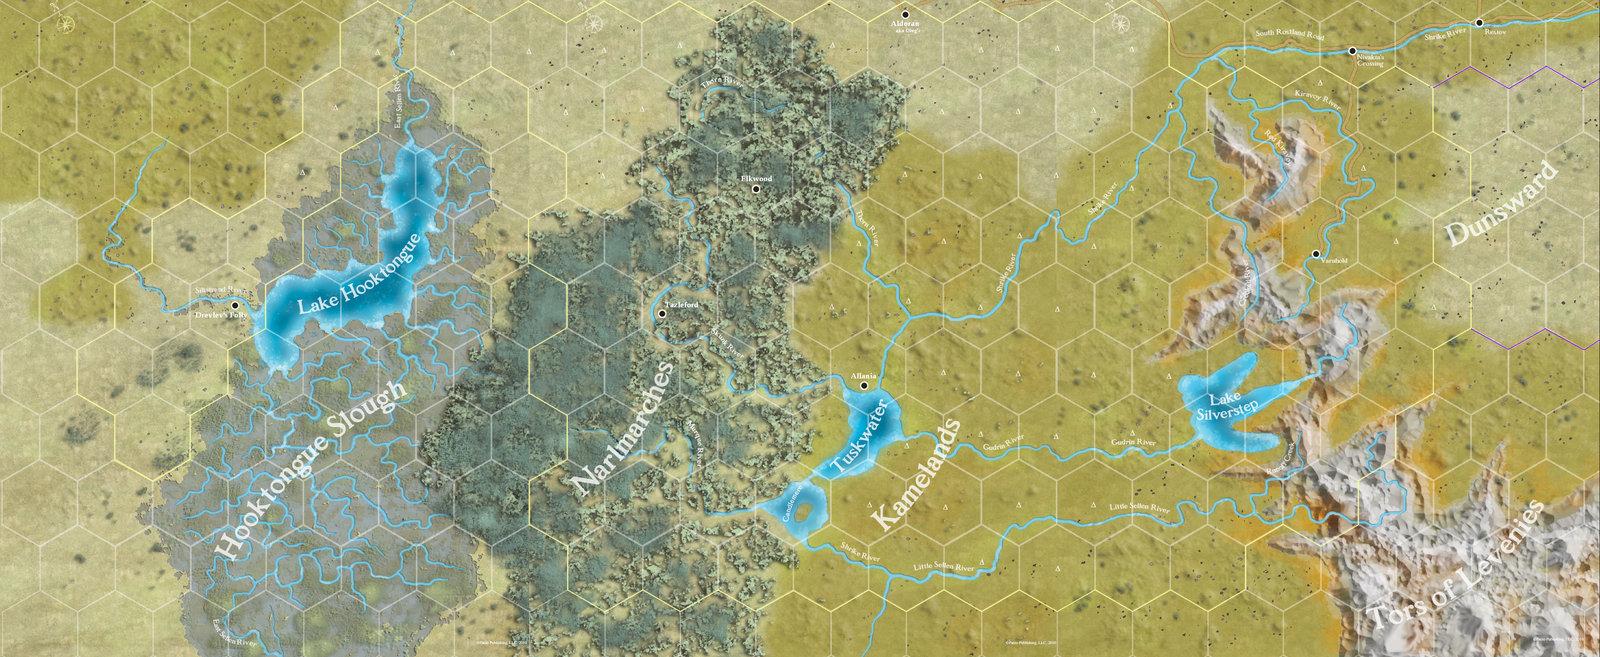 pathfinder_kingmaker_campaign_kingdom_map_by_mackarious-d4tmkki